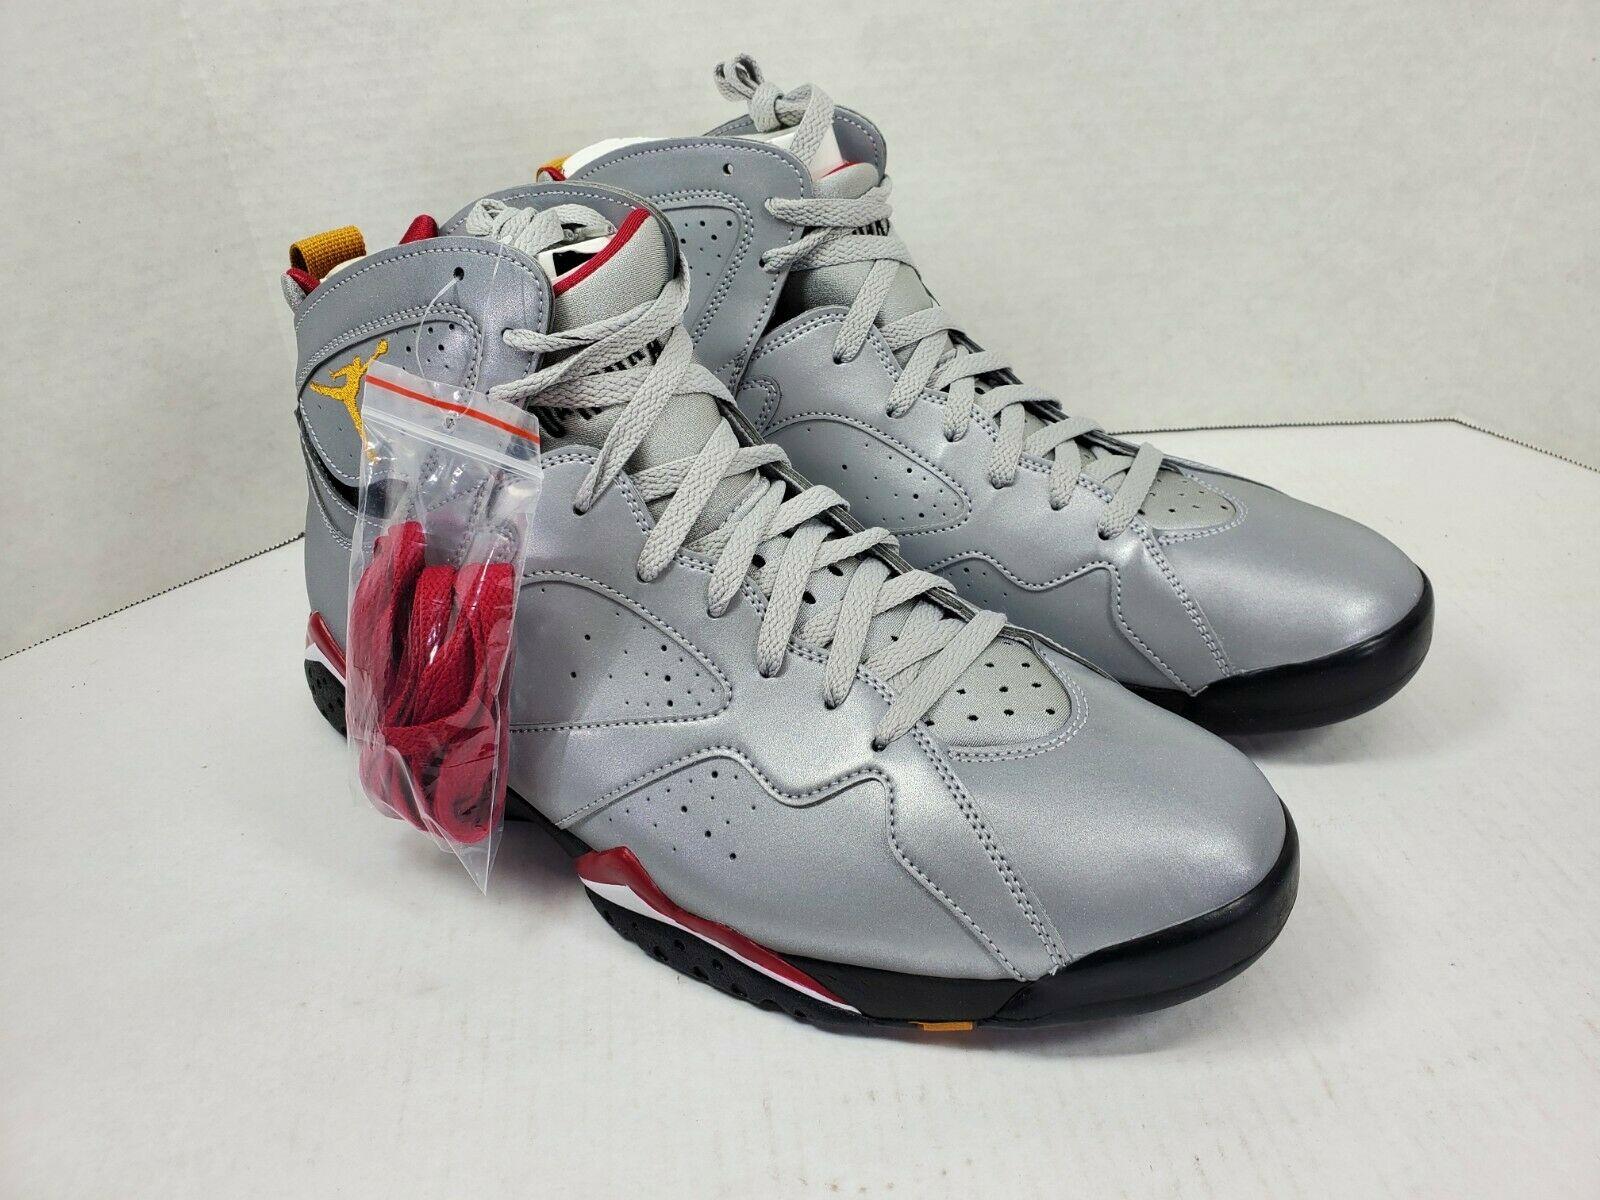 Jordan 7 Retro Reflections of a Champion